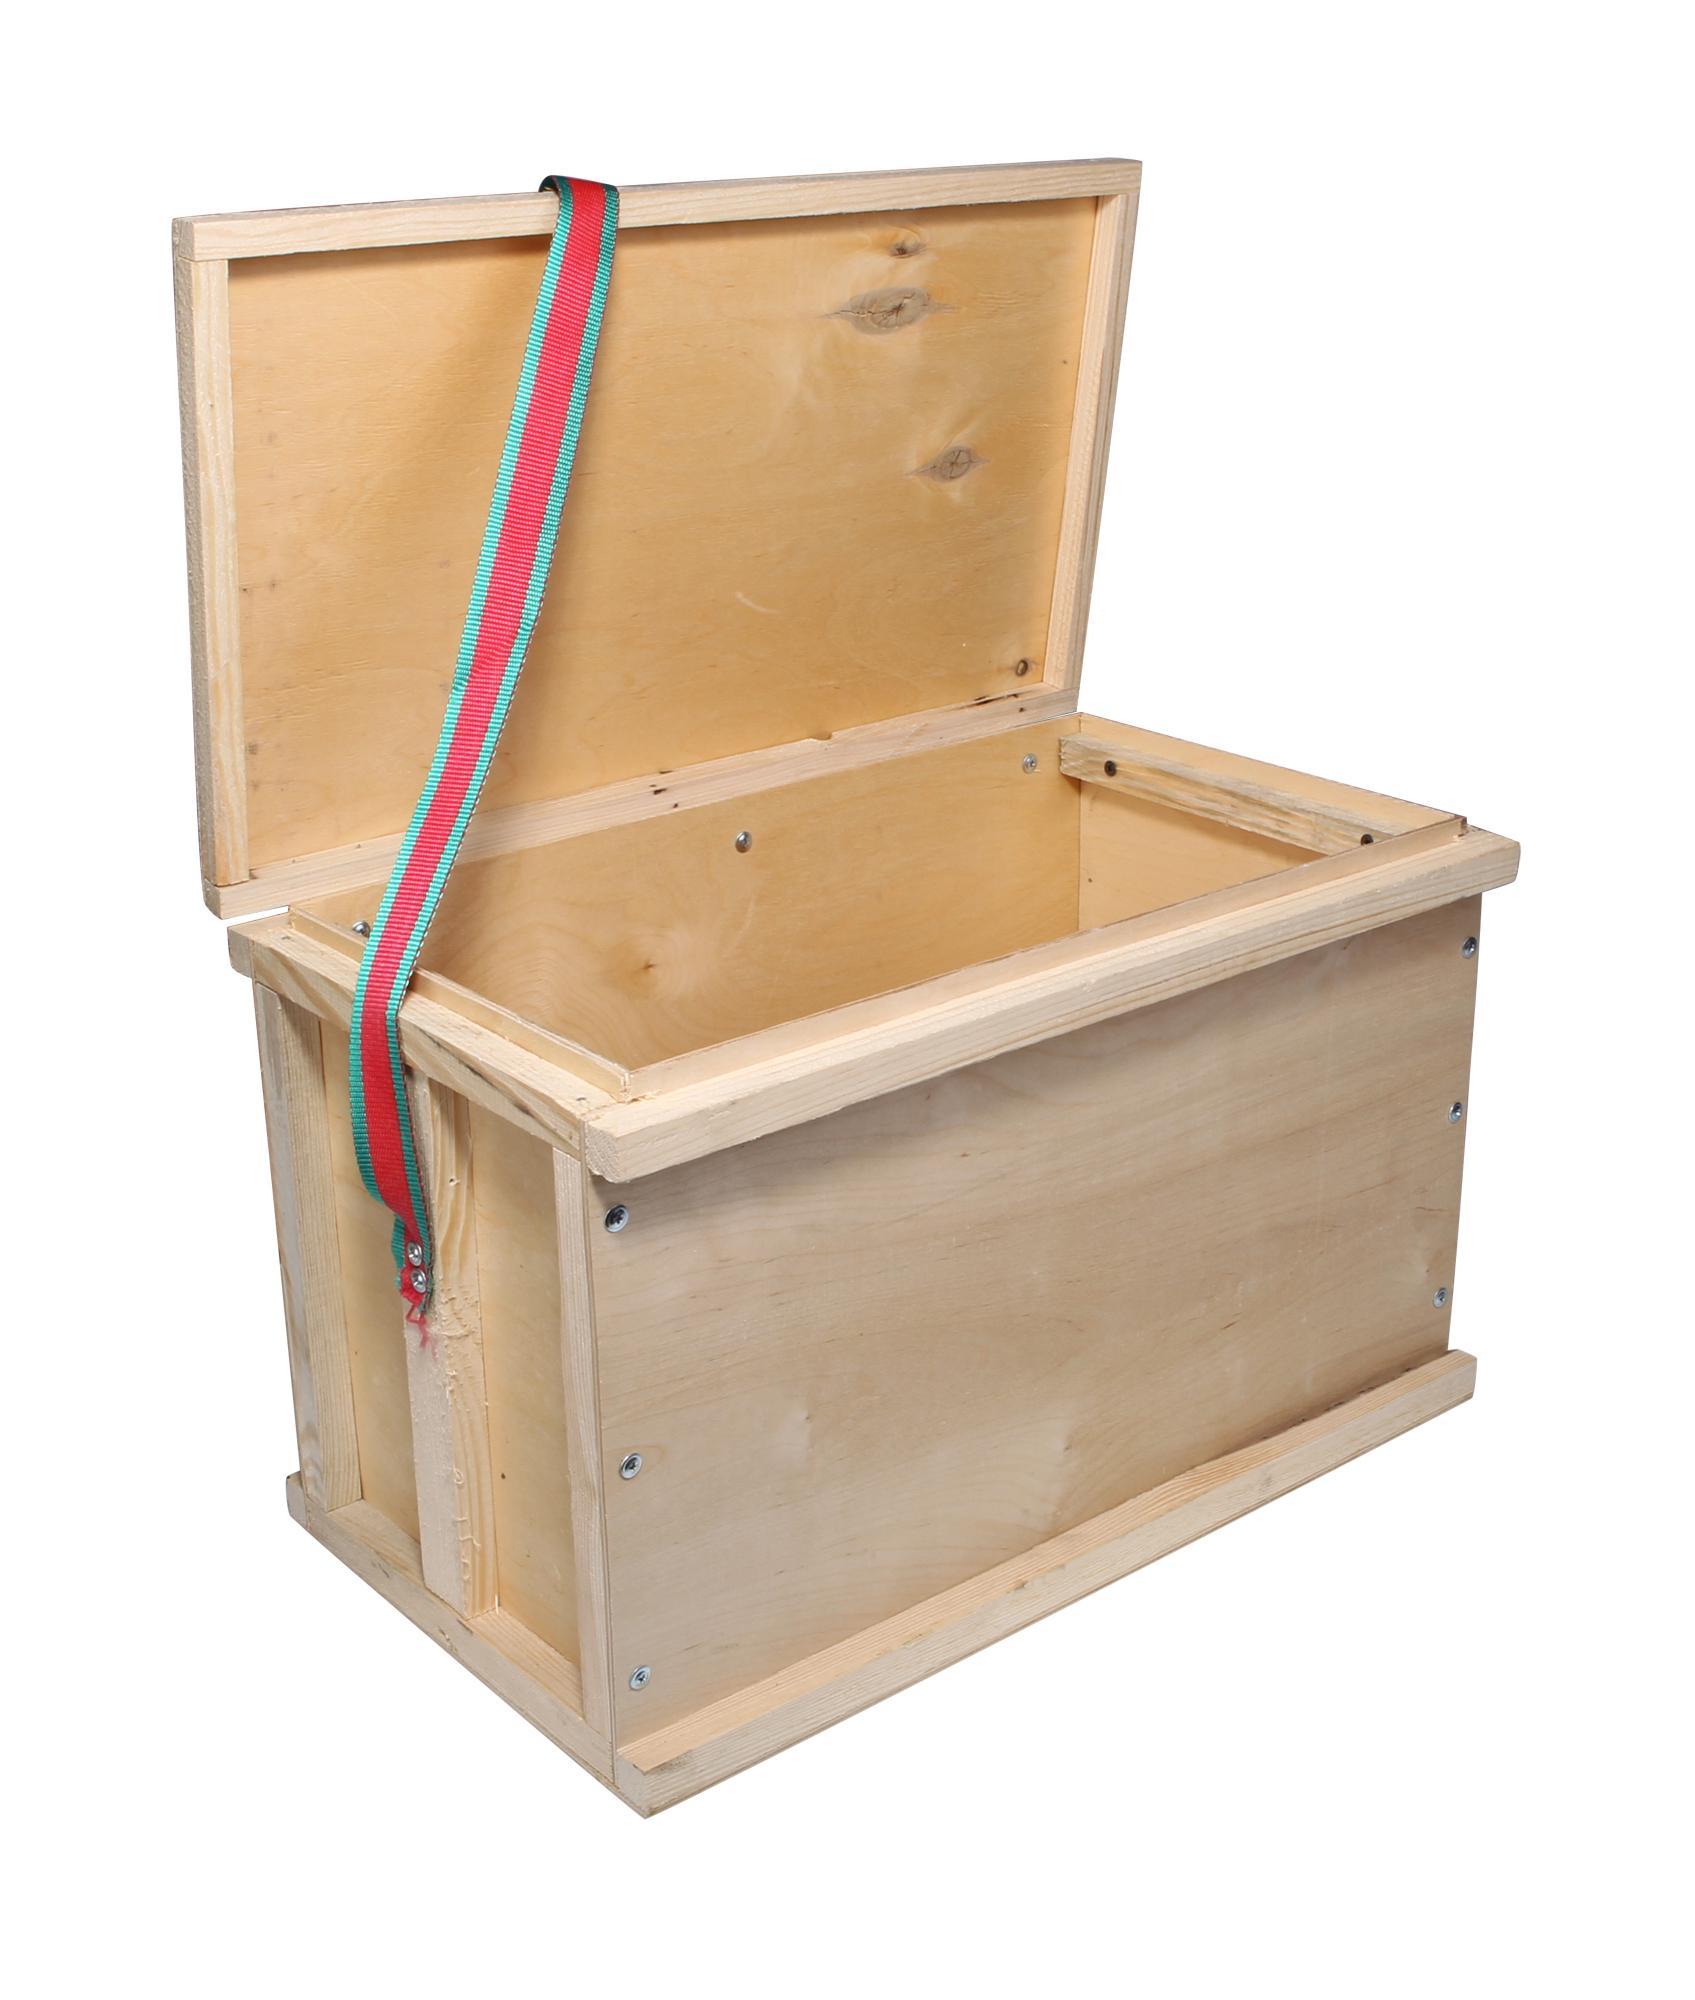 Ящики для переноски рамок своими руками 46